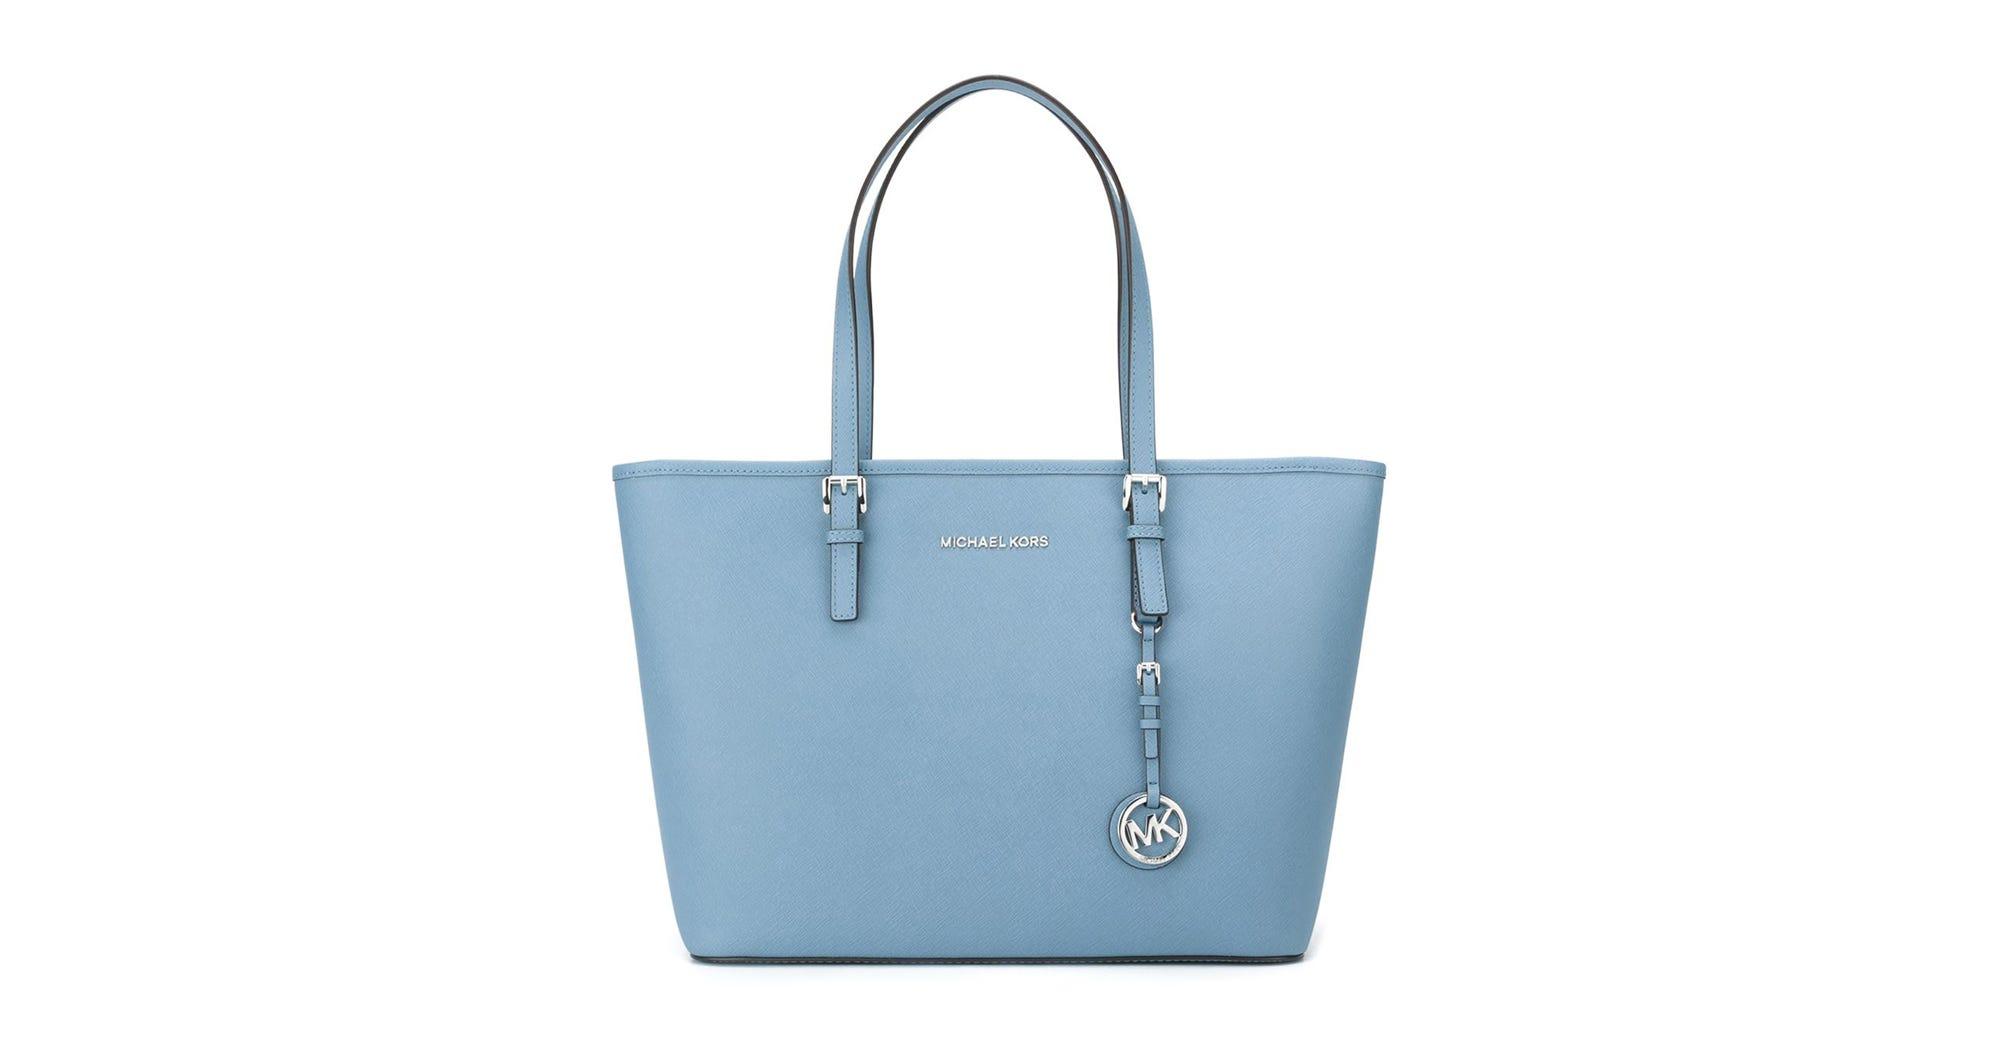 Most Popular Handbag Kors Michael Brand Teen Trend 4R5jqcA3LS